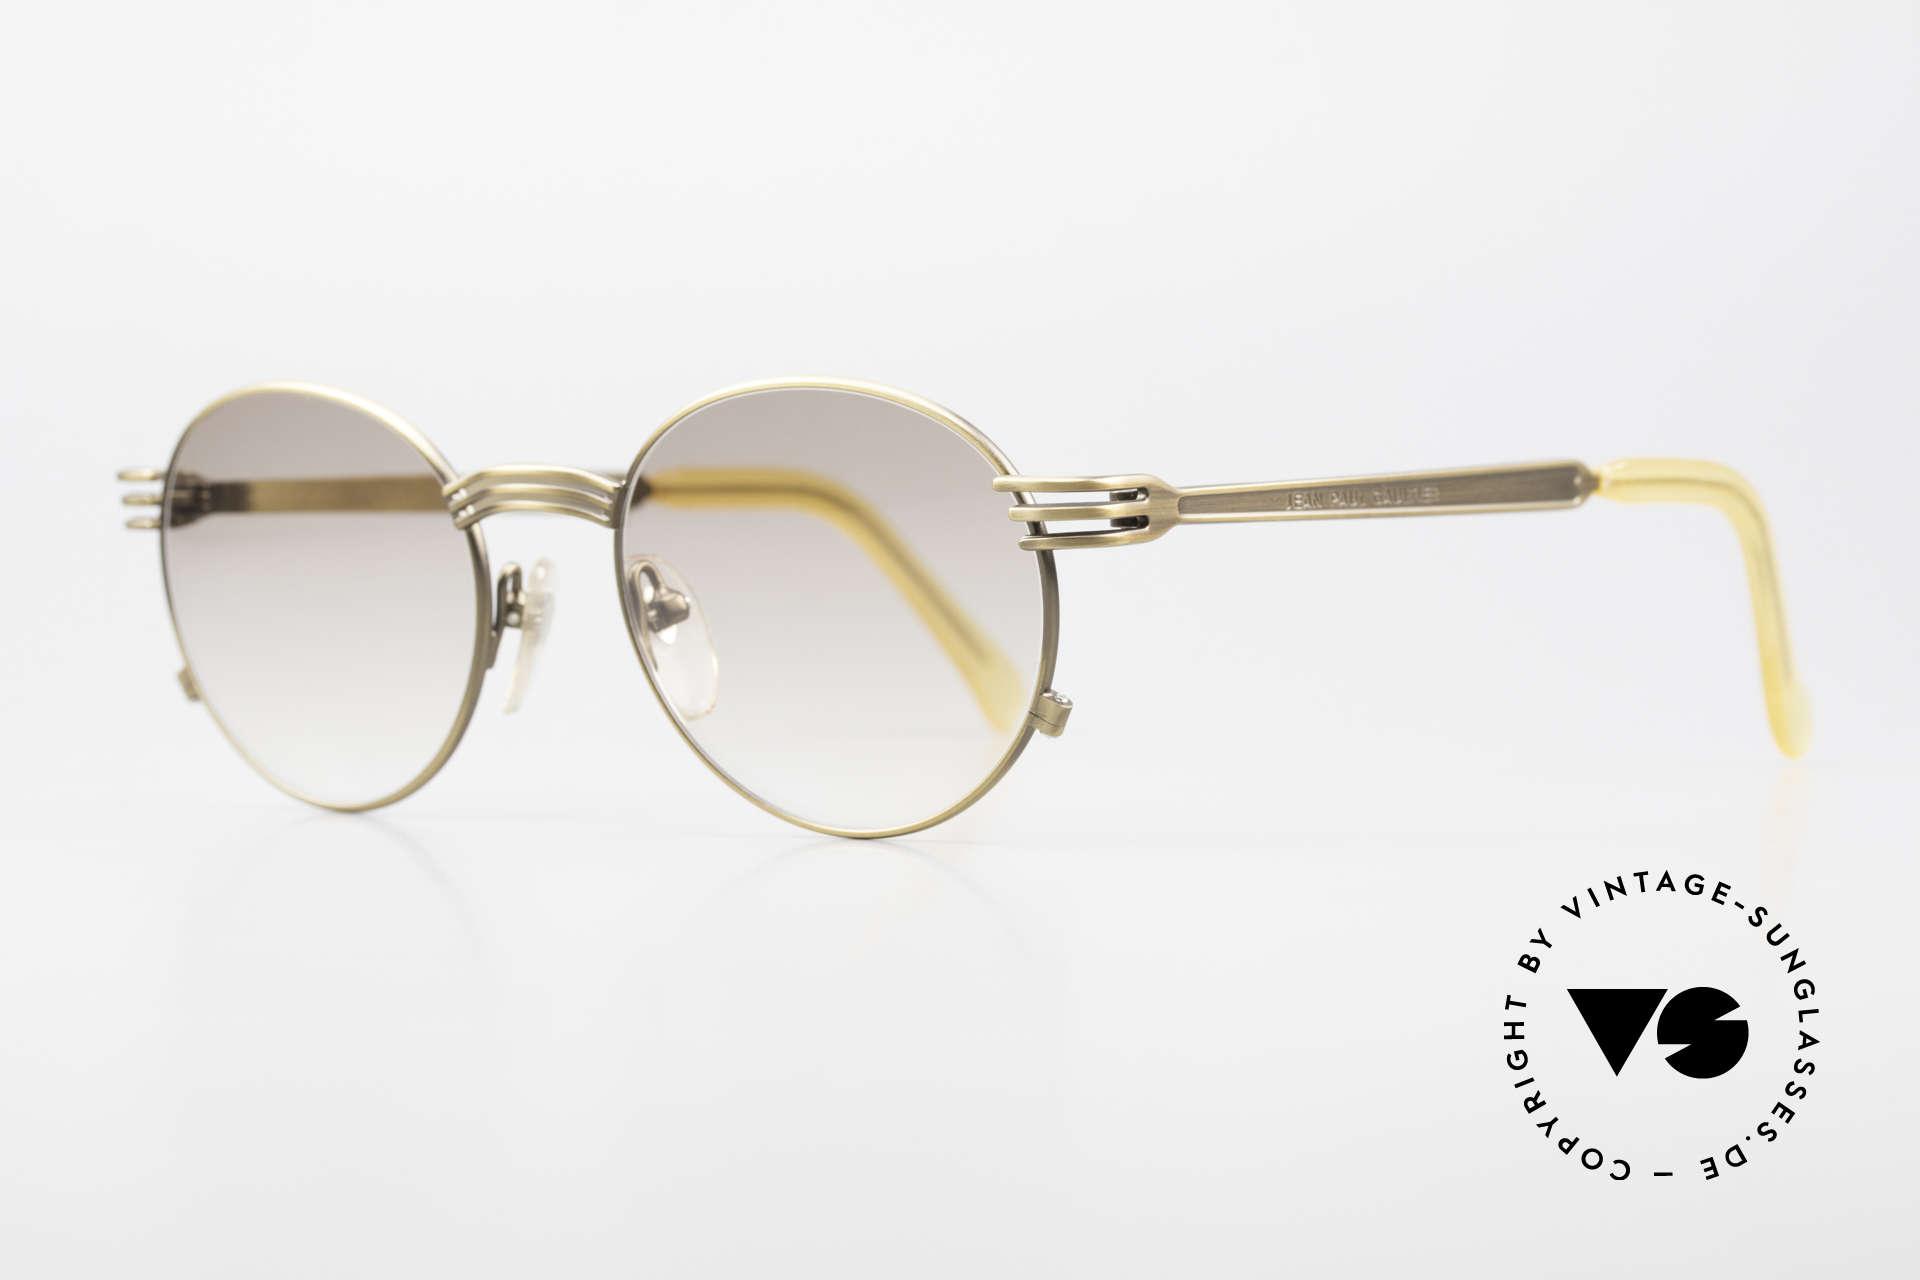 Jean Paul Gaultier 55-3174 Designer Vintage Glasses 90's, tangible top-notch craftsmanship; frame made in Japan, Made for Men and Women